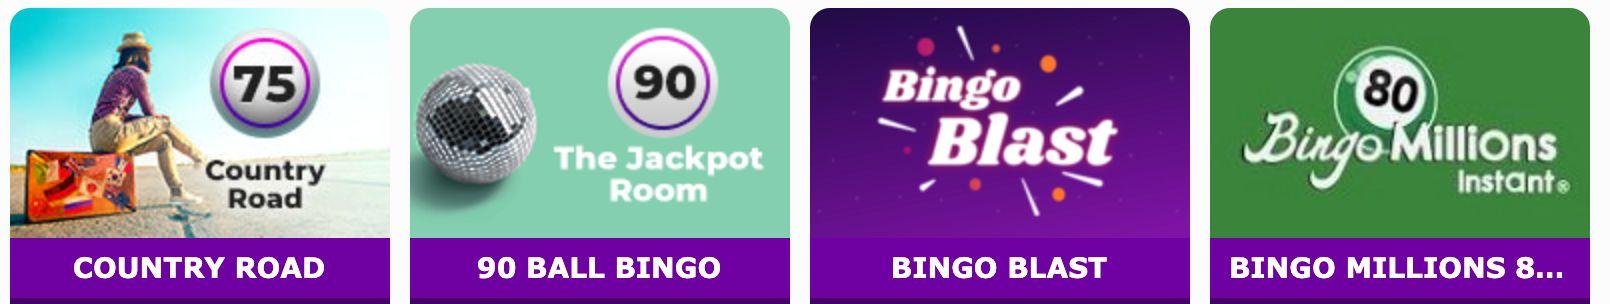 Anytime Bingo Games